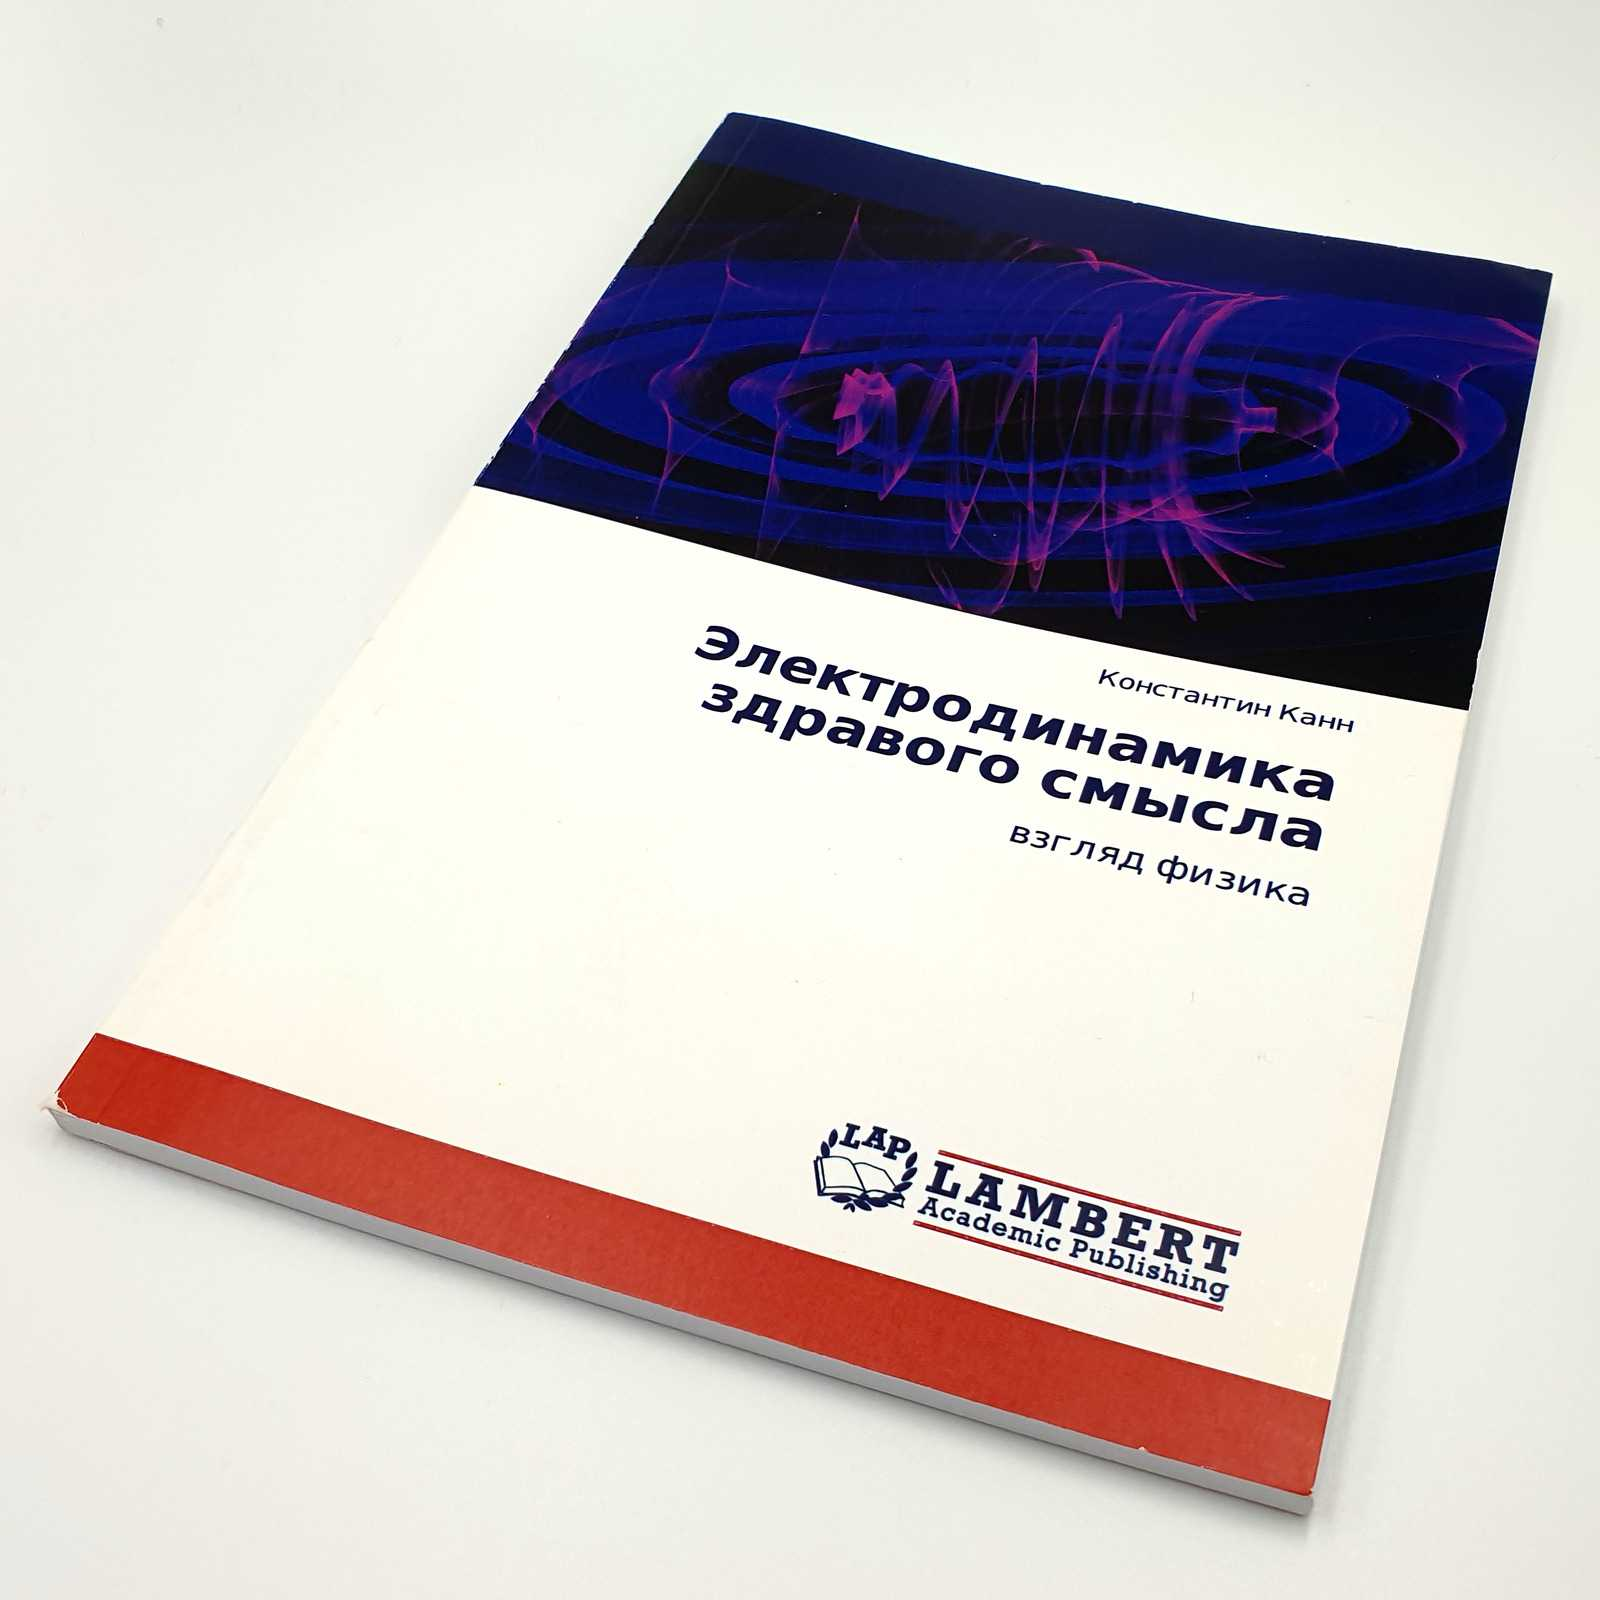 Книга «Электродинамика здравого смысла. Взгляд физика».